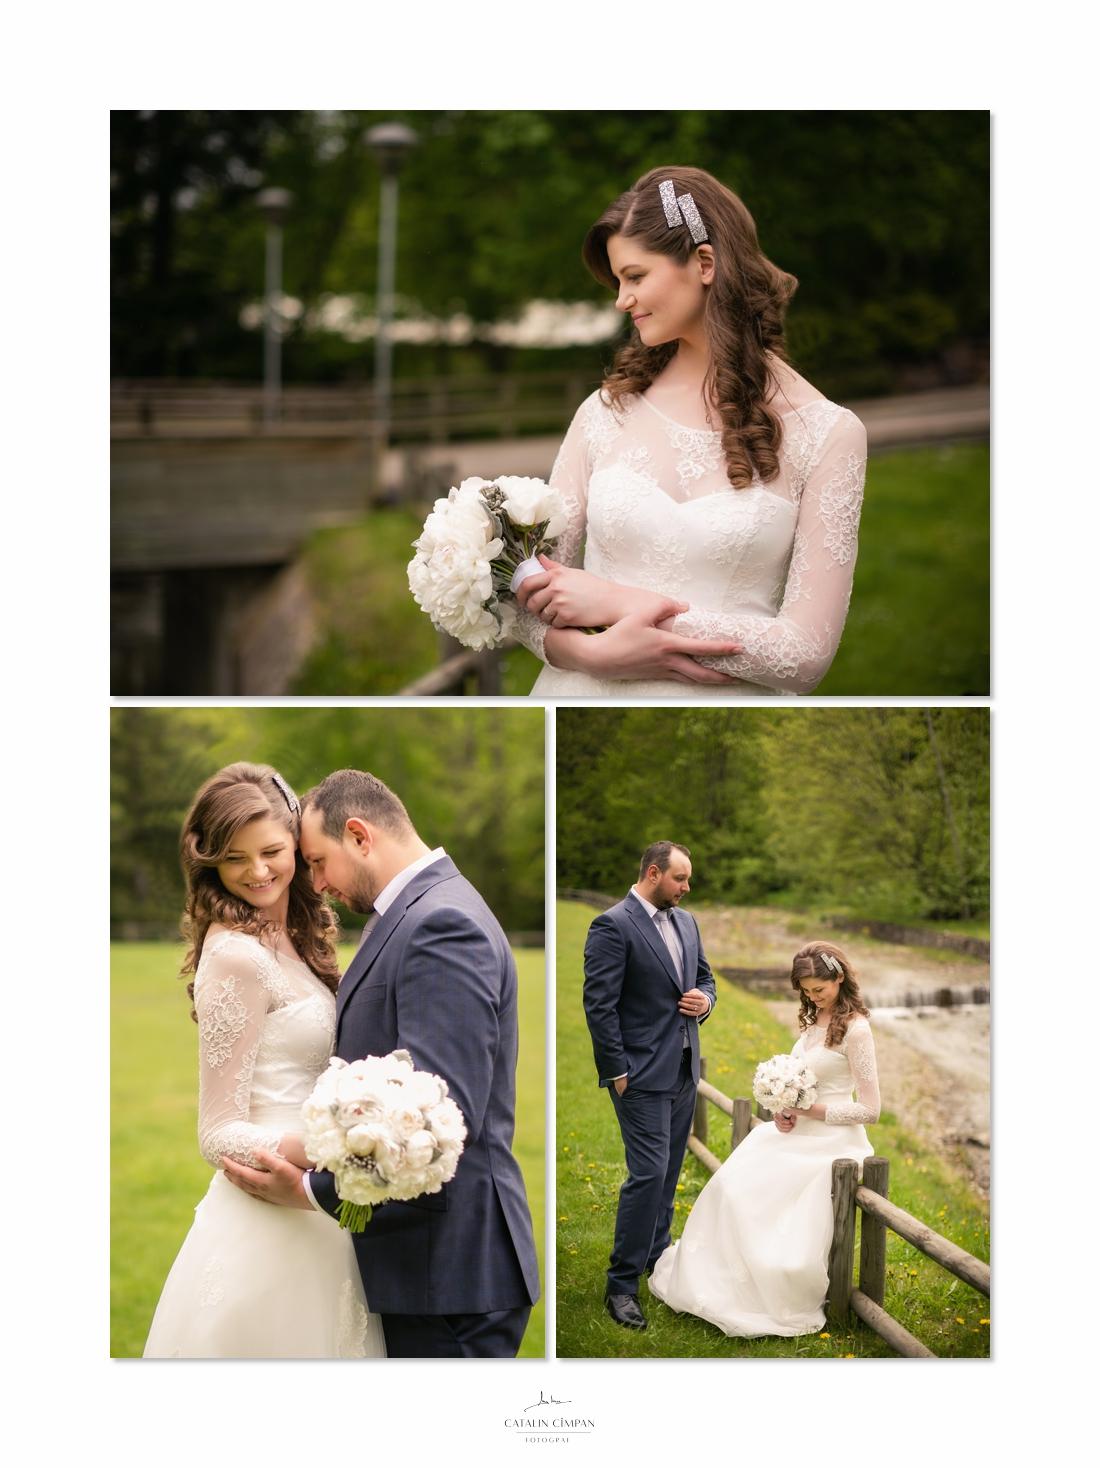 Adriana-Dani-fotografii-nunta-sucevita-12